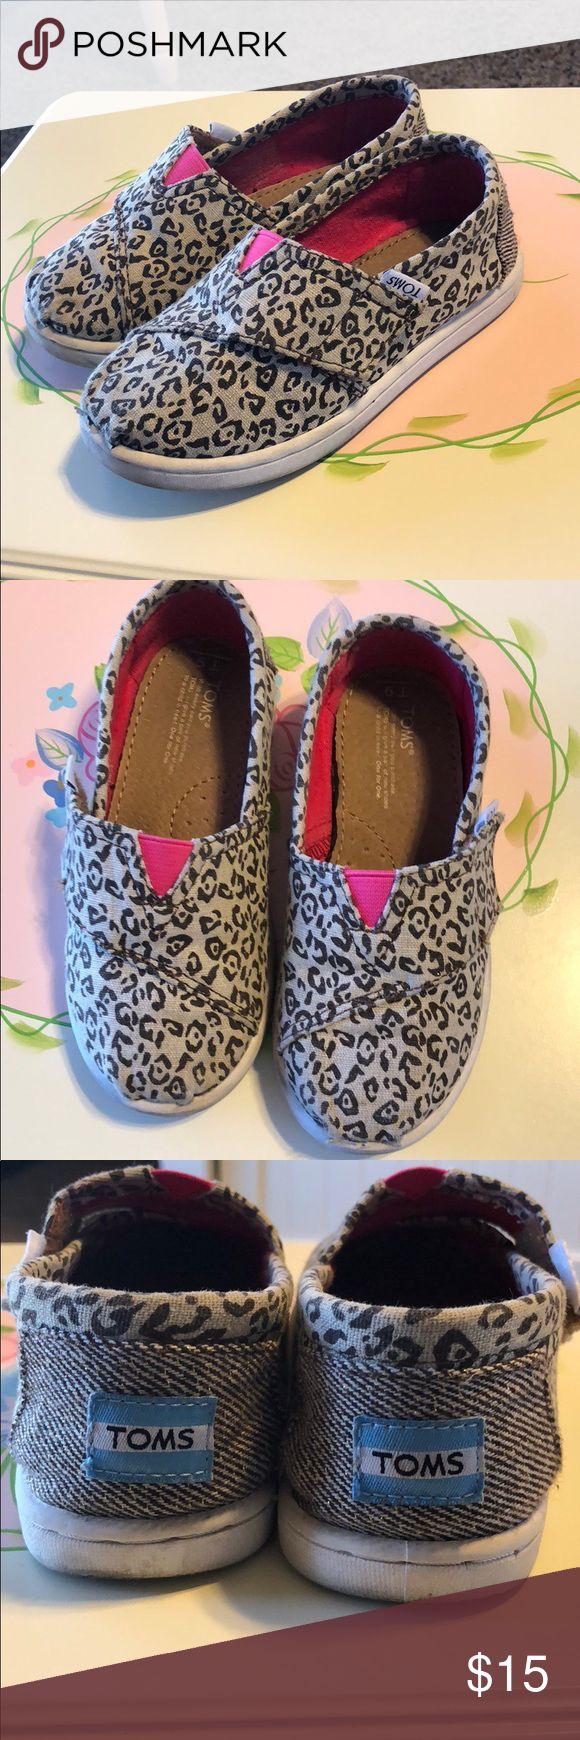 Tiny toms size 9 EUC tiny toms leopard print Toms Shoes